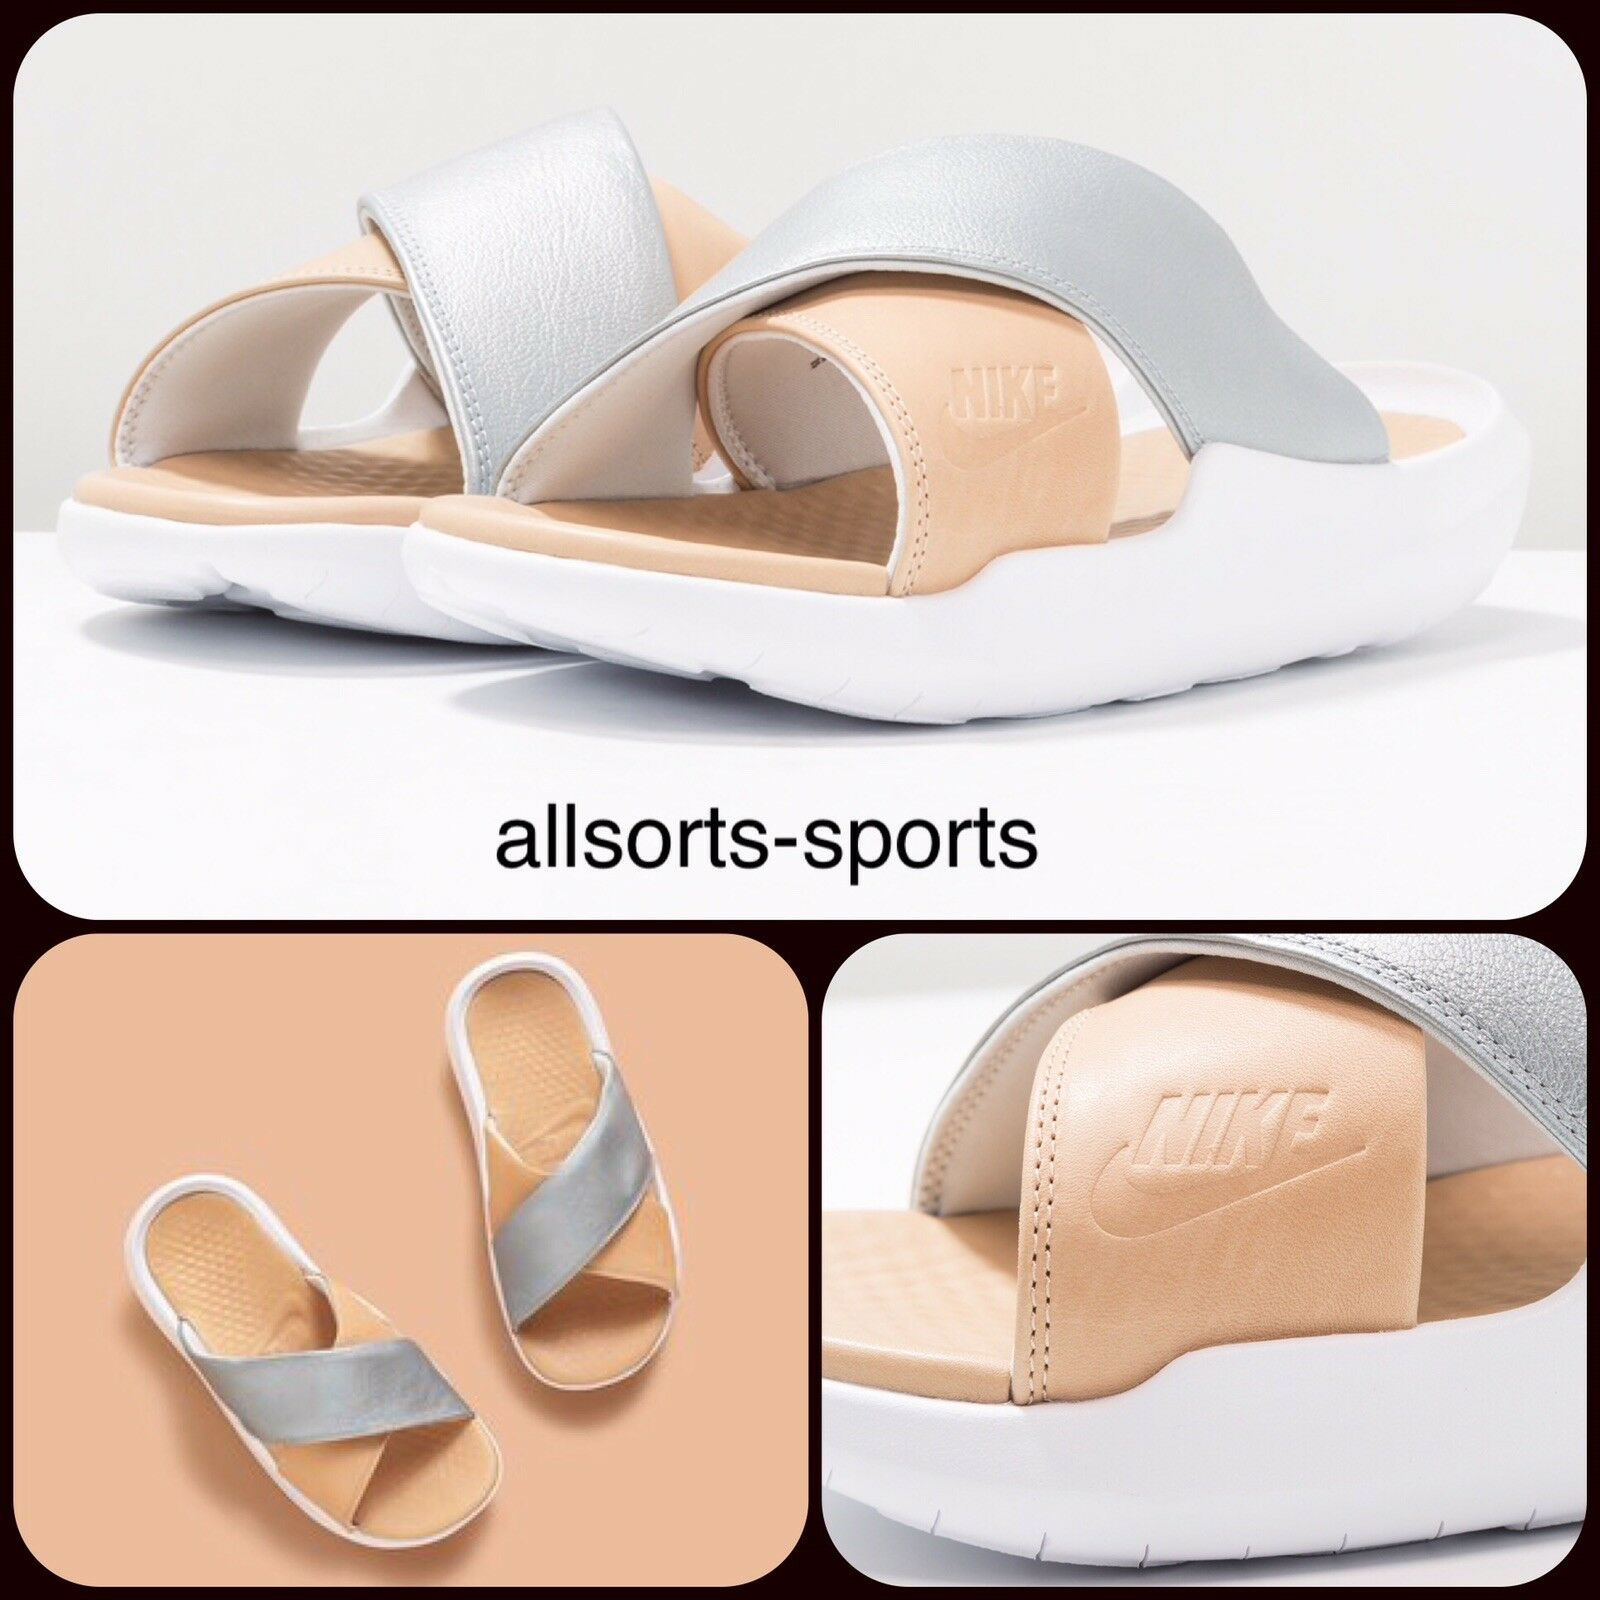 Nike Benassi futuro CROCE se se se Premium Donna  diapositive EU 40.5 AO2641-001 21049f